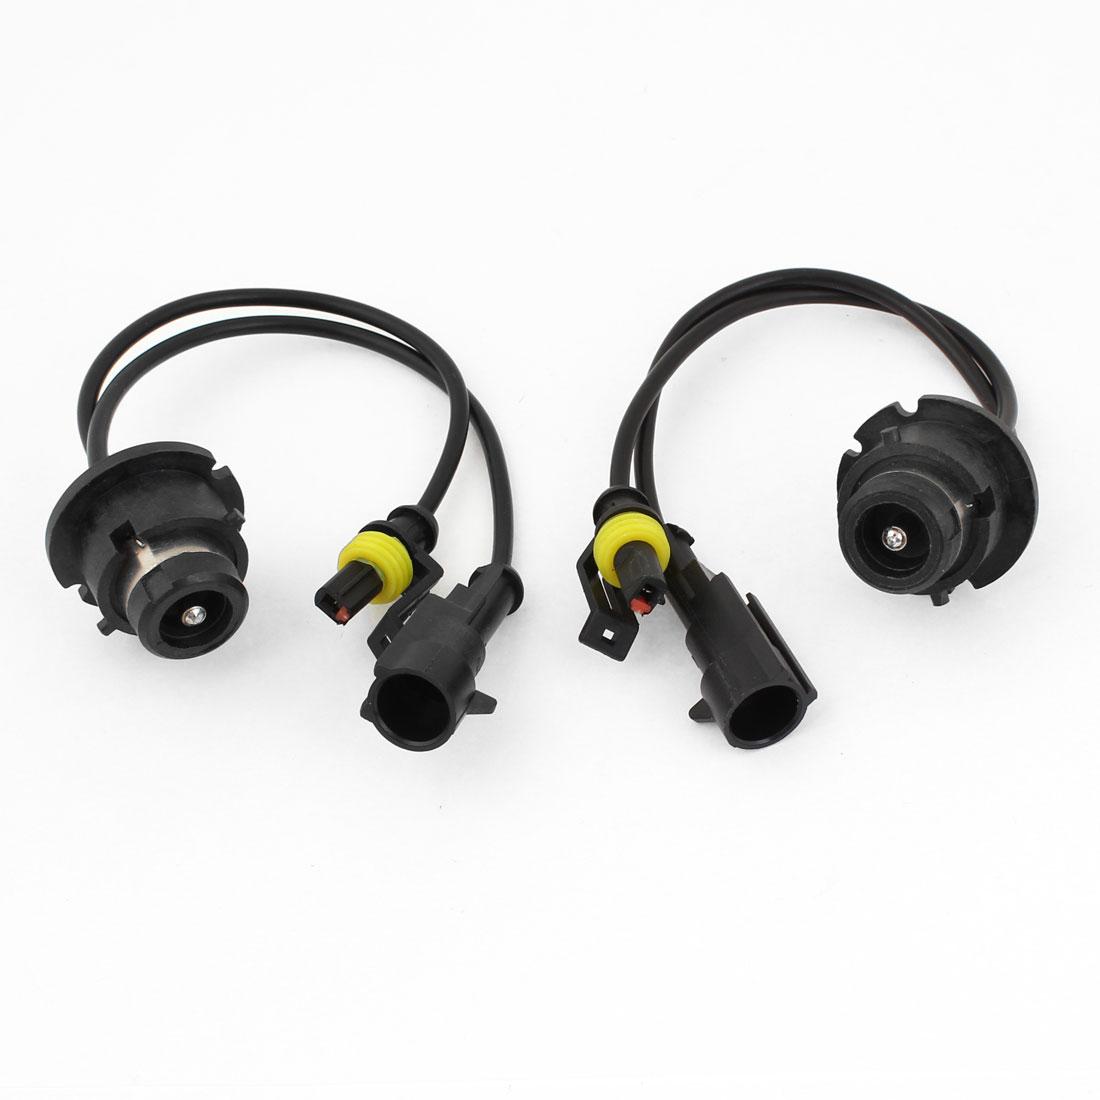 Adapters Plugs Xenon HID D2S D2R Ballast 2 Pcs